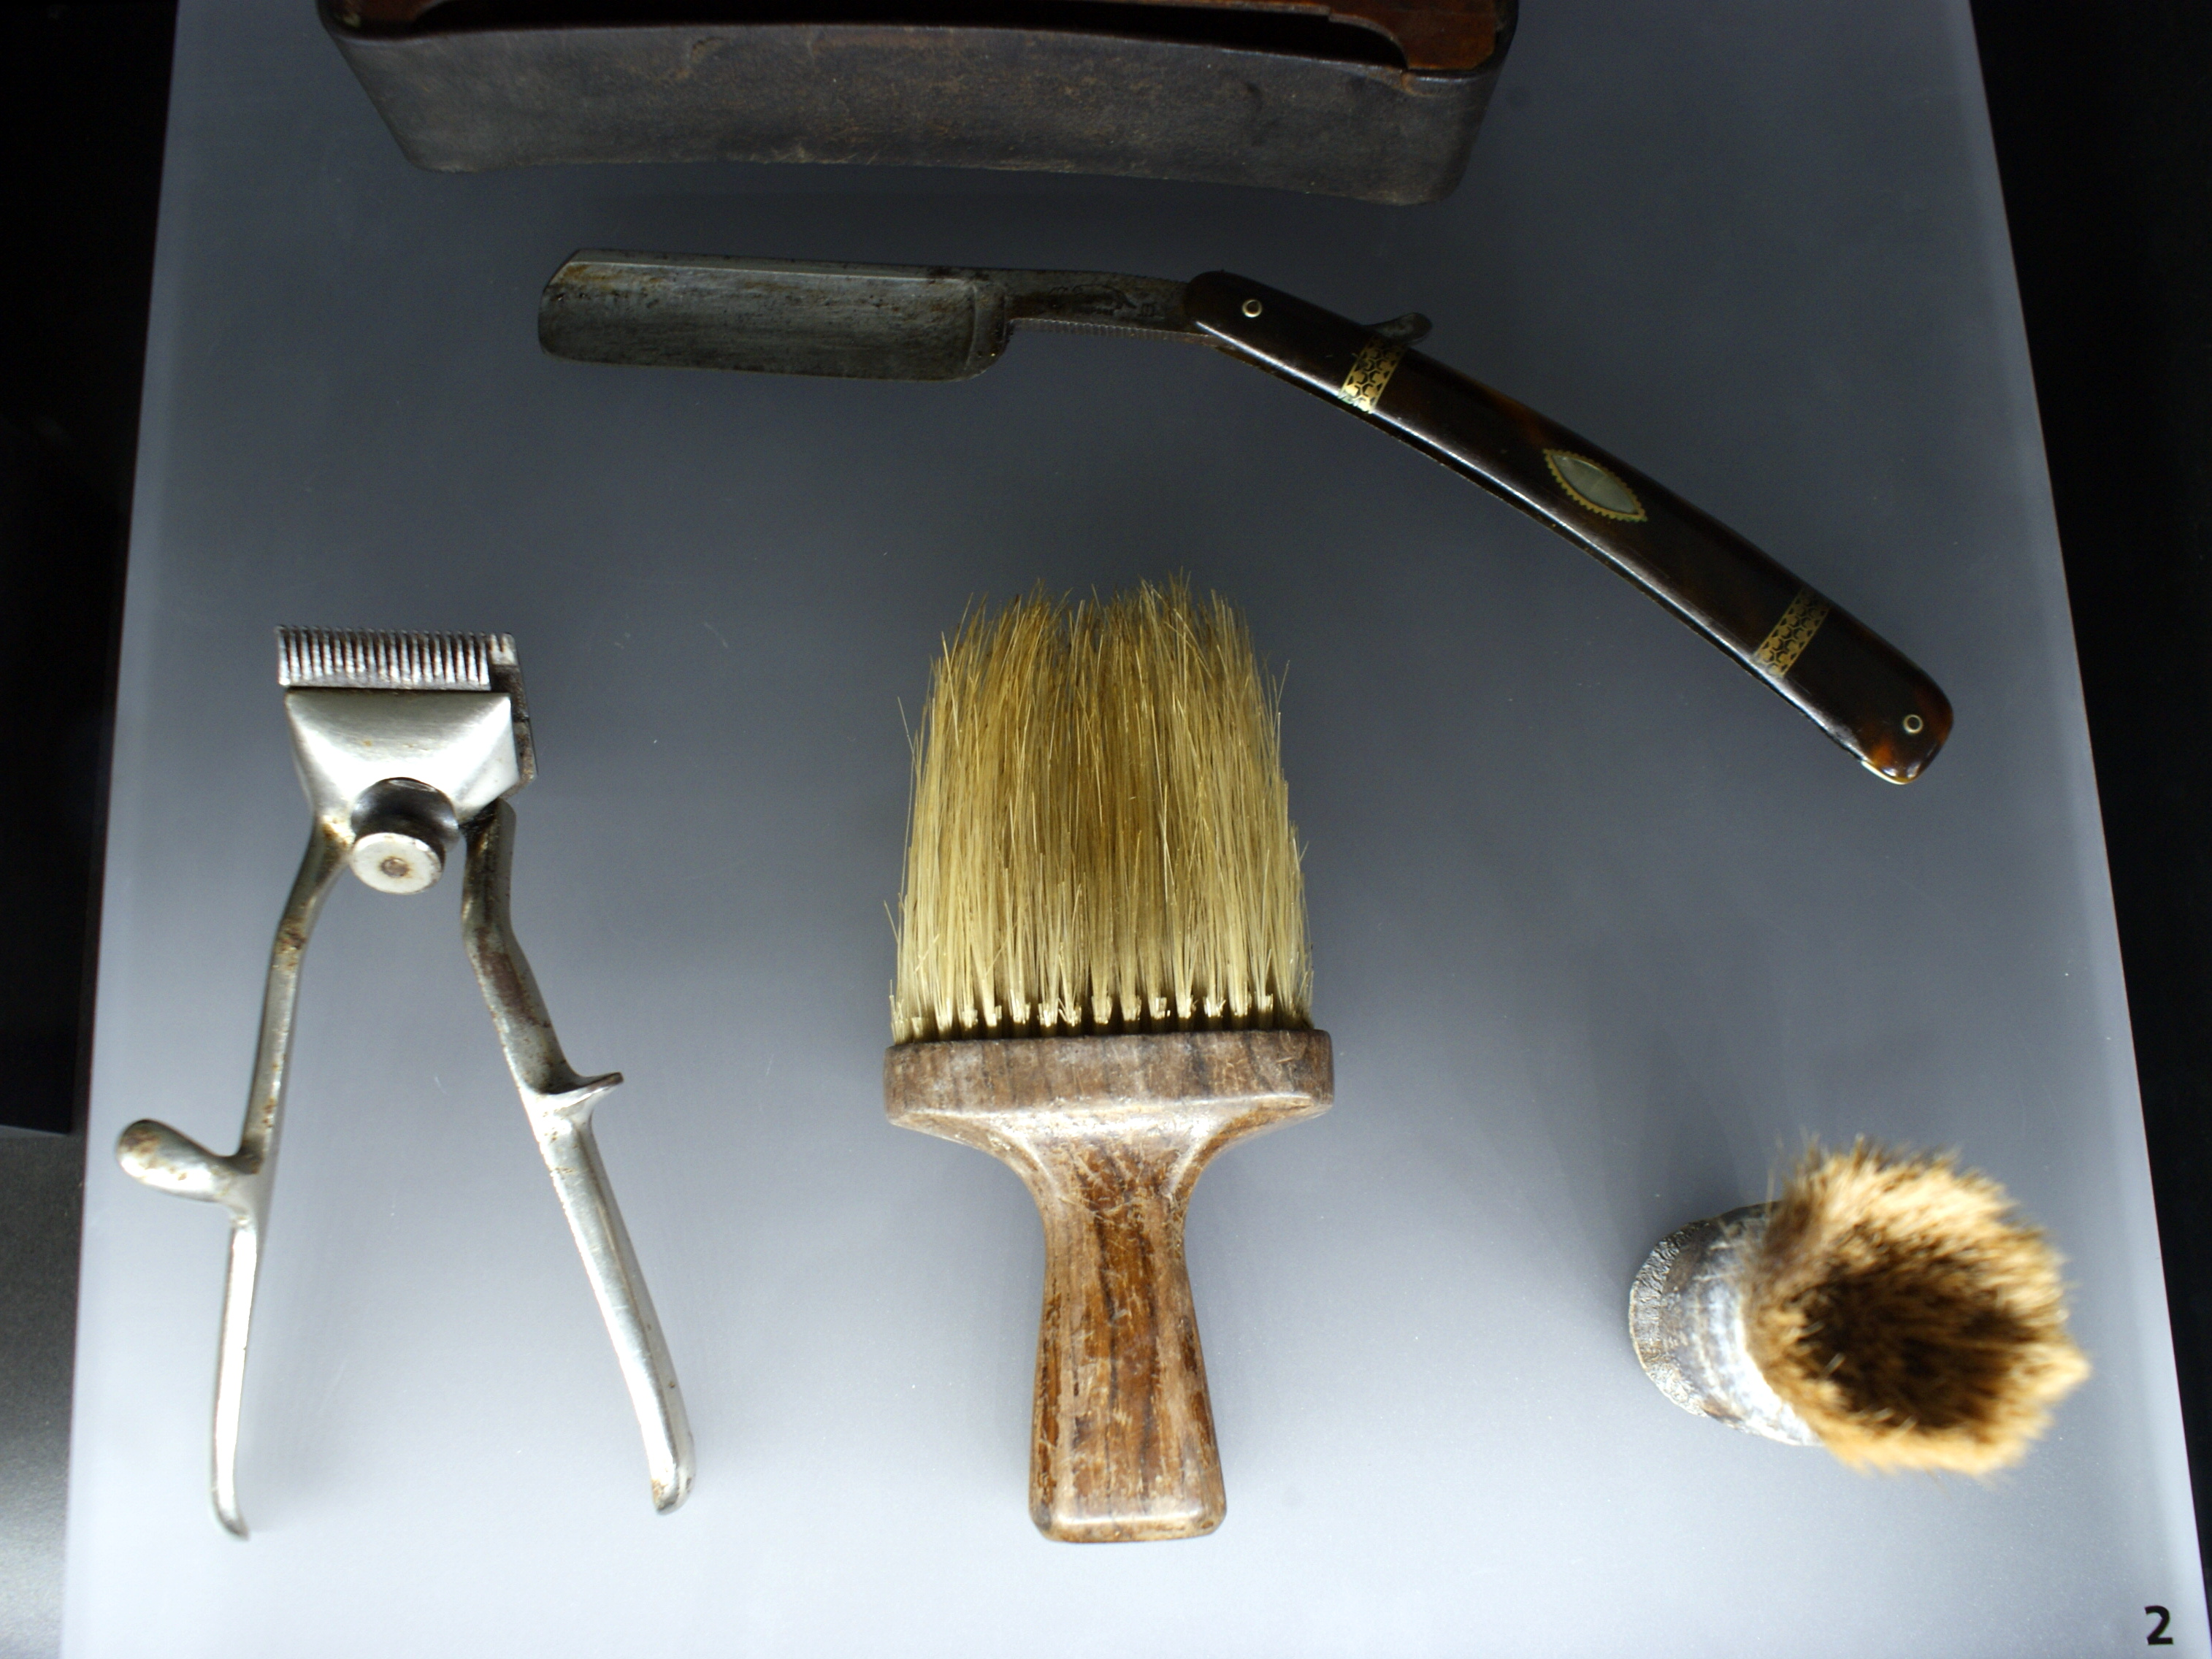 Barber tools ryan hellyer - Barber Tools